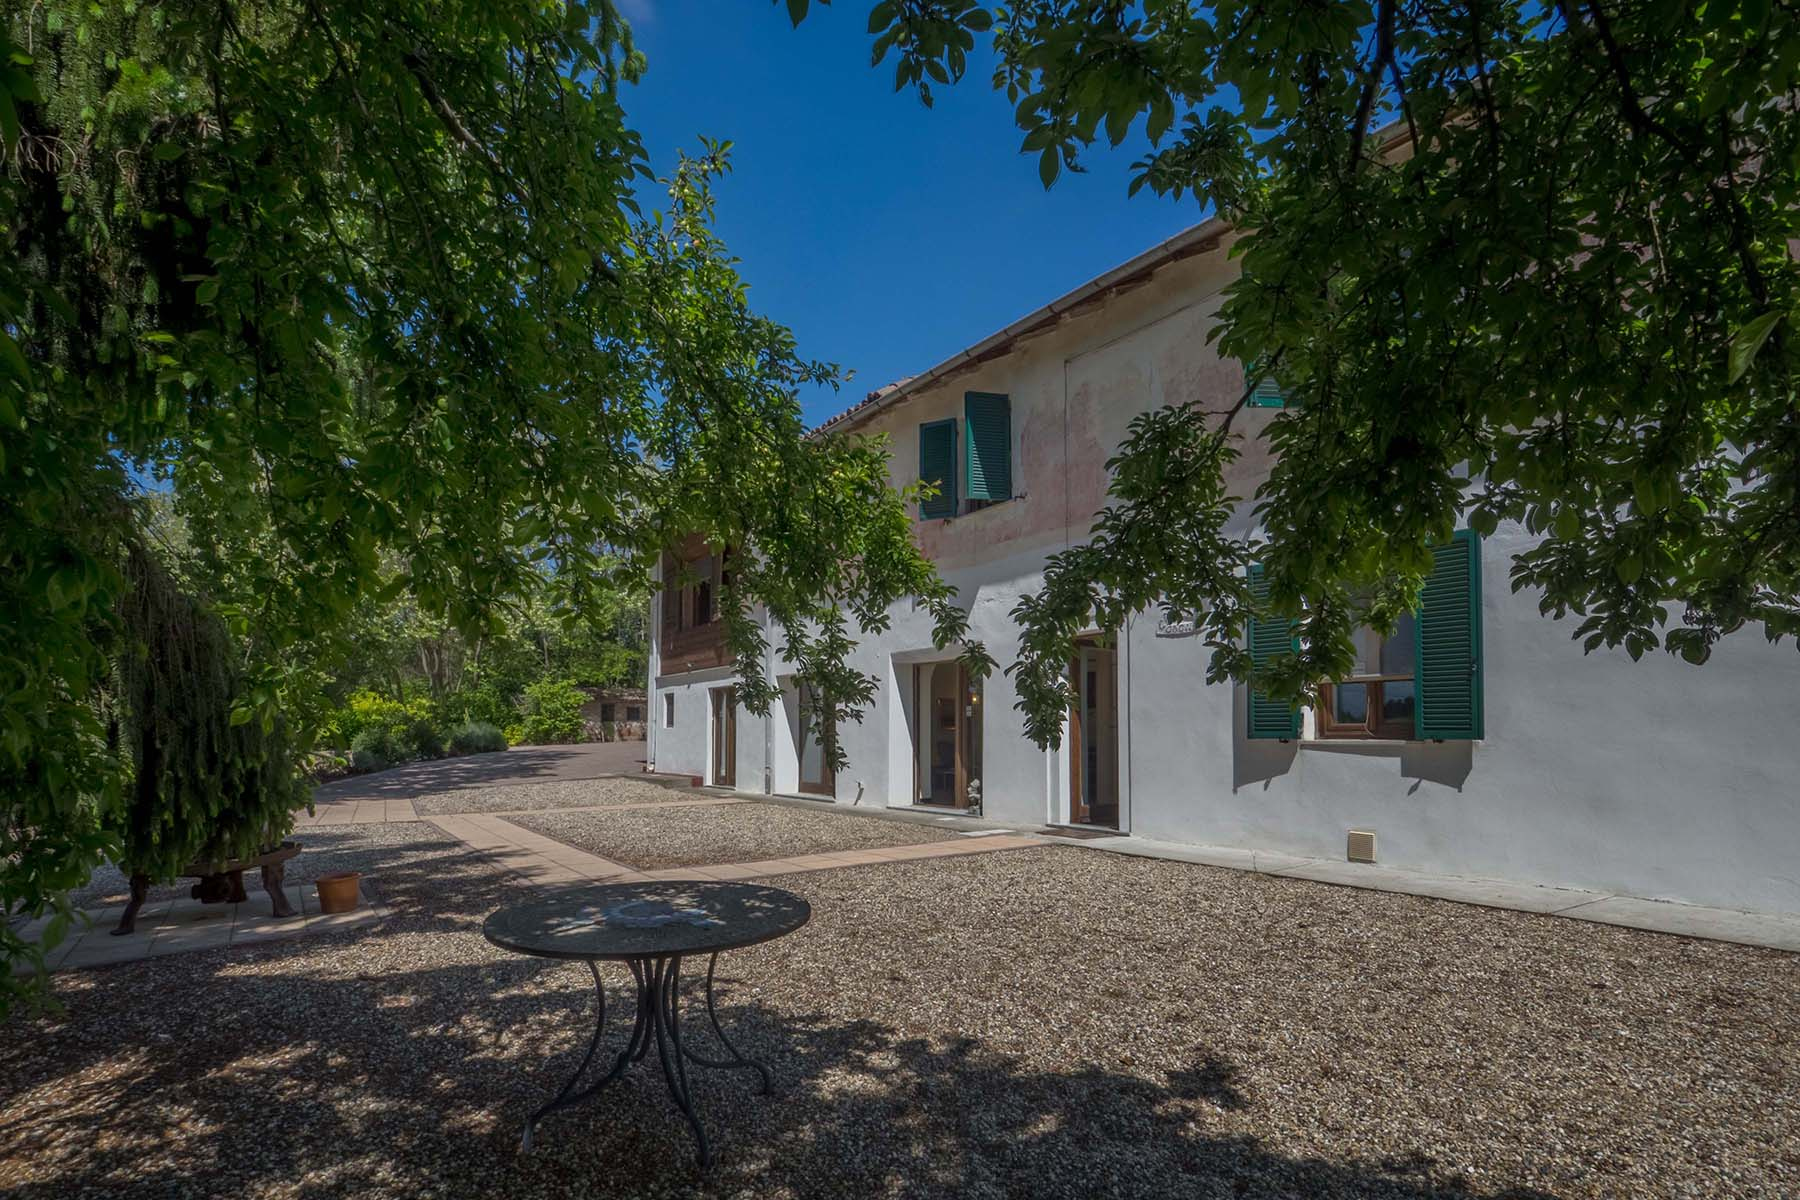 Casa indipendente in Vendita a Novi Ligure: 5 locali, 280 mq